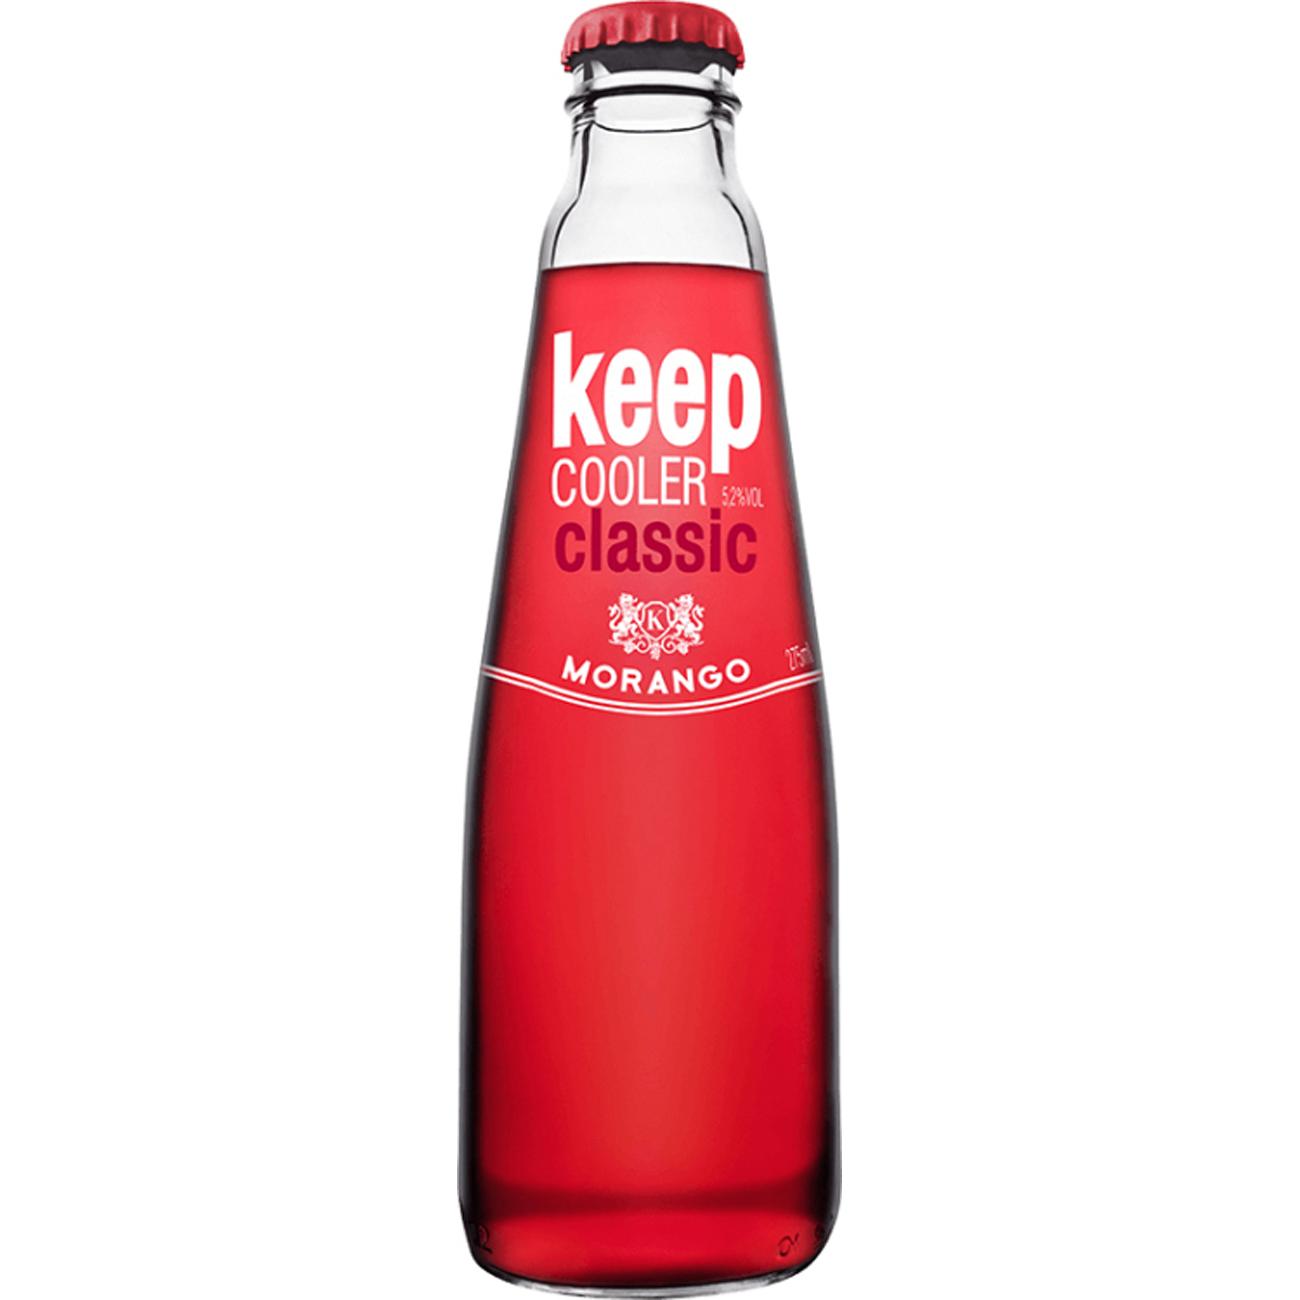 Keep Cooler Morango 275 Ml